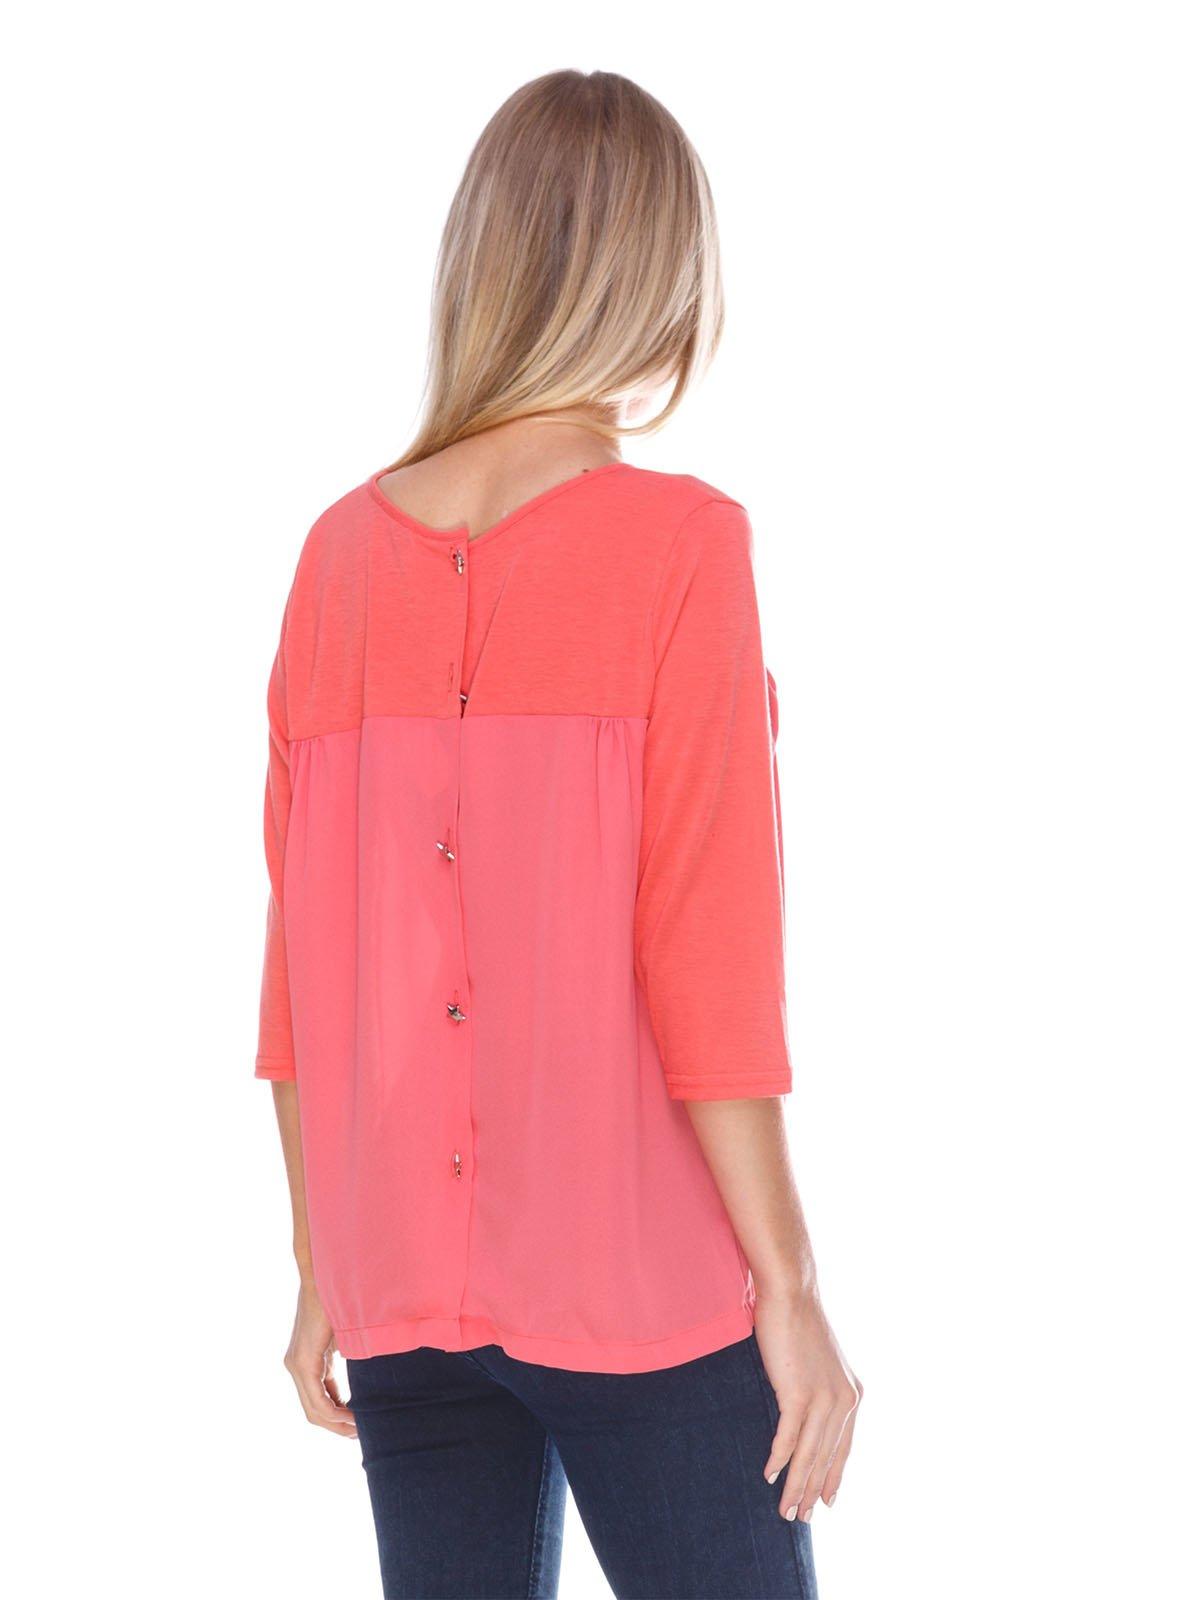 Блуза коралловая   3423802   фото 2